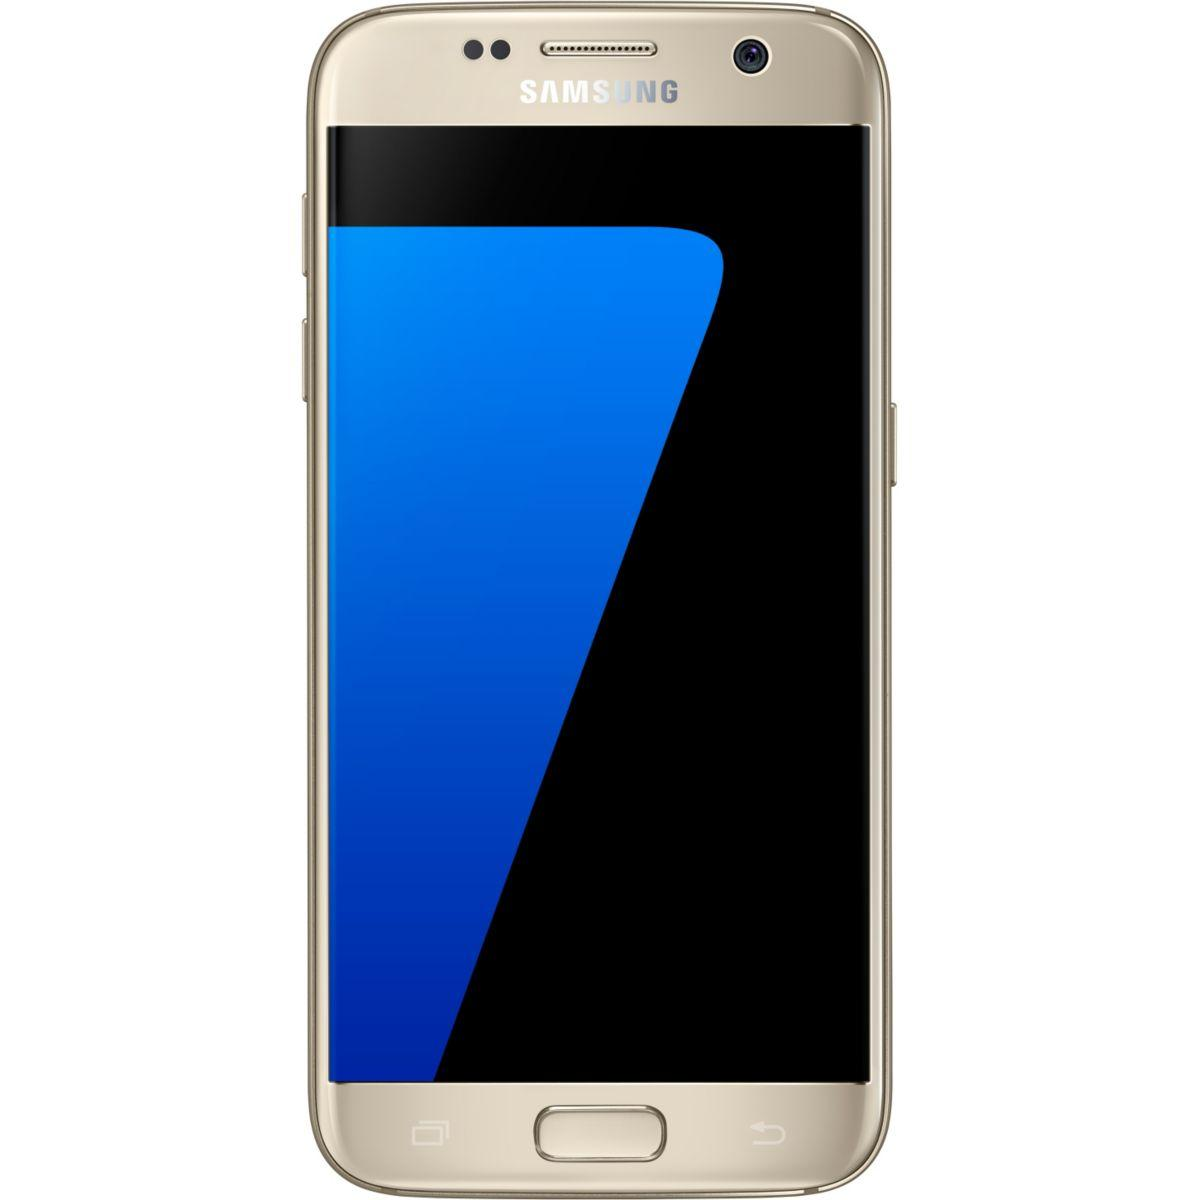 Pack promo smartphone samsung galaxy s7 32 go or + etui samsung flip wallet galaxy s7 gold - soldes et bonnes affaires à prix imbattables